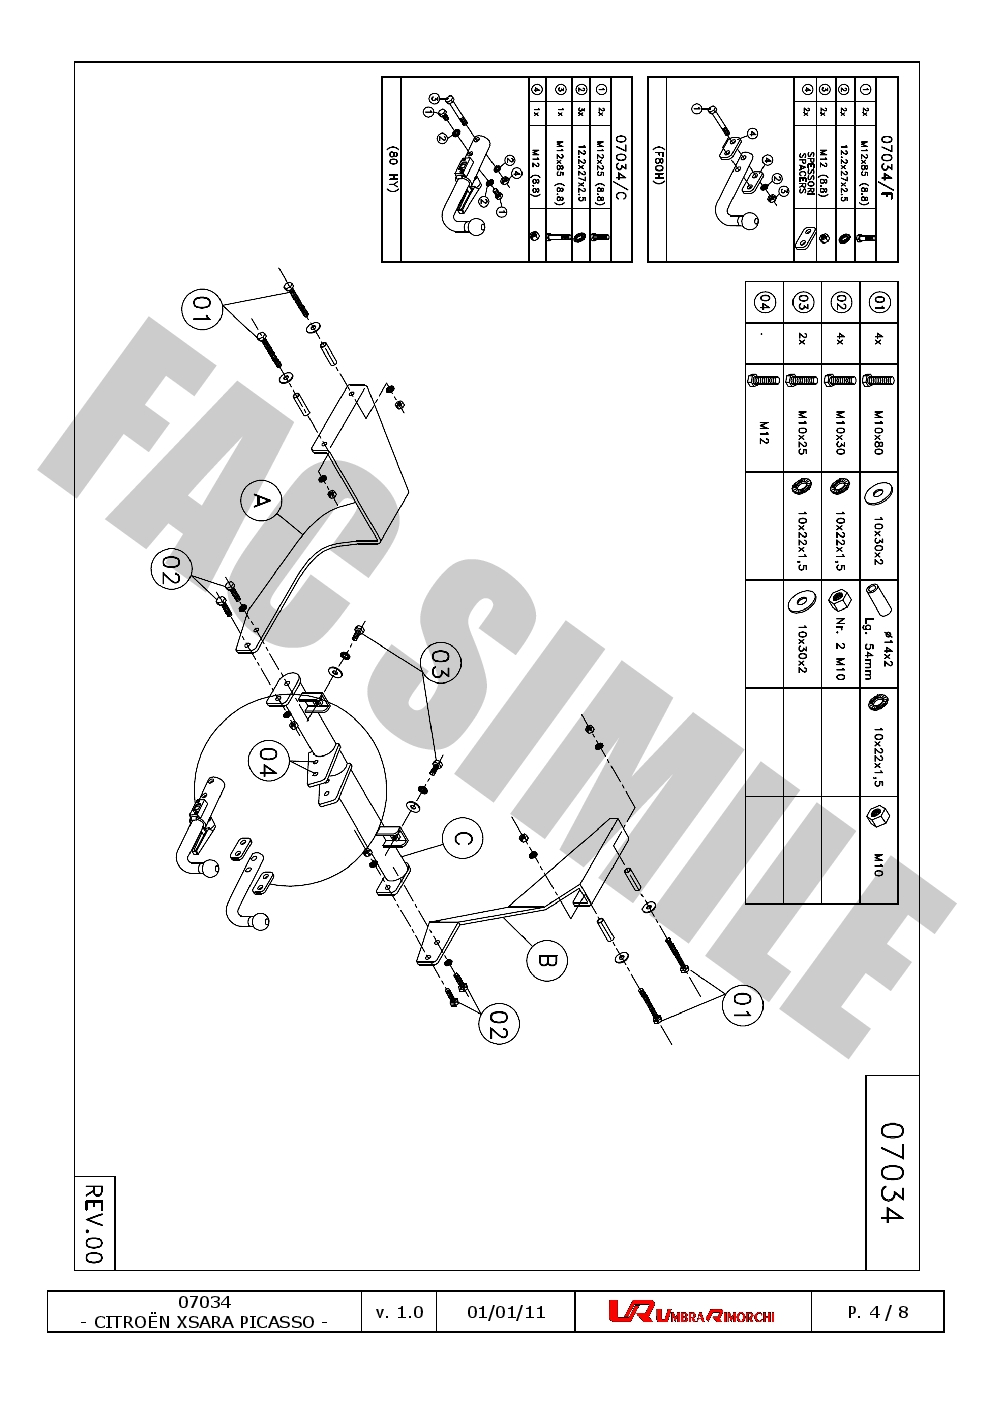 Citroen Hy Wiring Diagram - Wiring Diagram rent-camaro-b -  rent-camaro-b.graniantichiumbri.it | Citroen Hy Wiring Diagram |  | graniantichiumbri.it